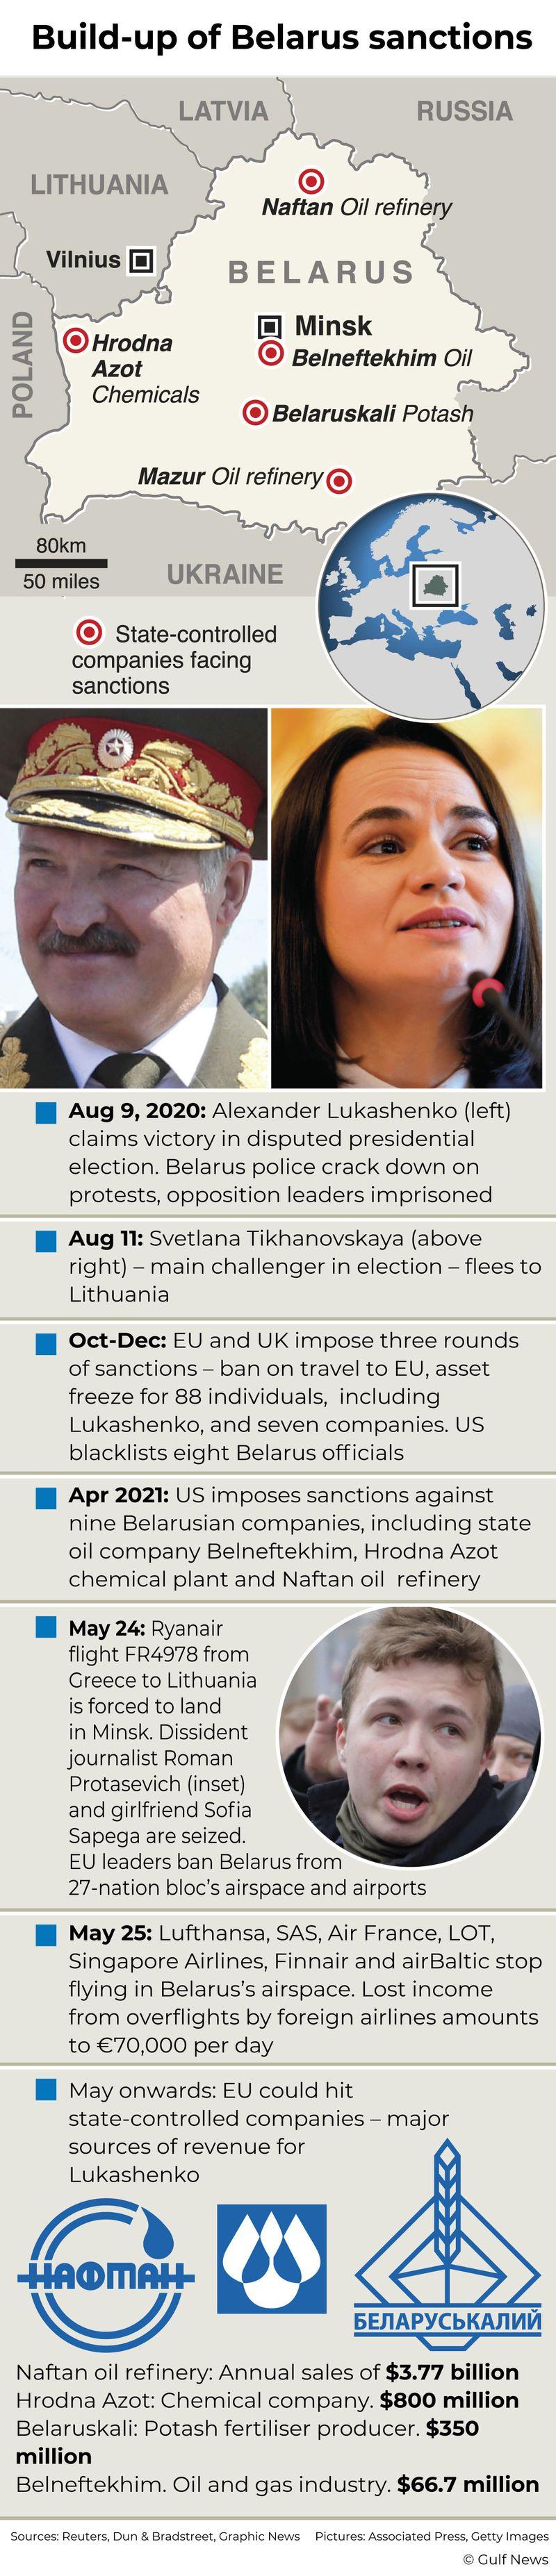 Infographic: Build-up of Belarus sanctions